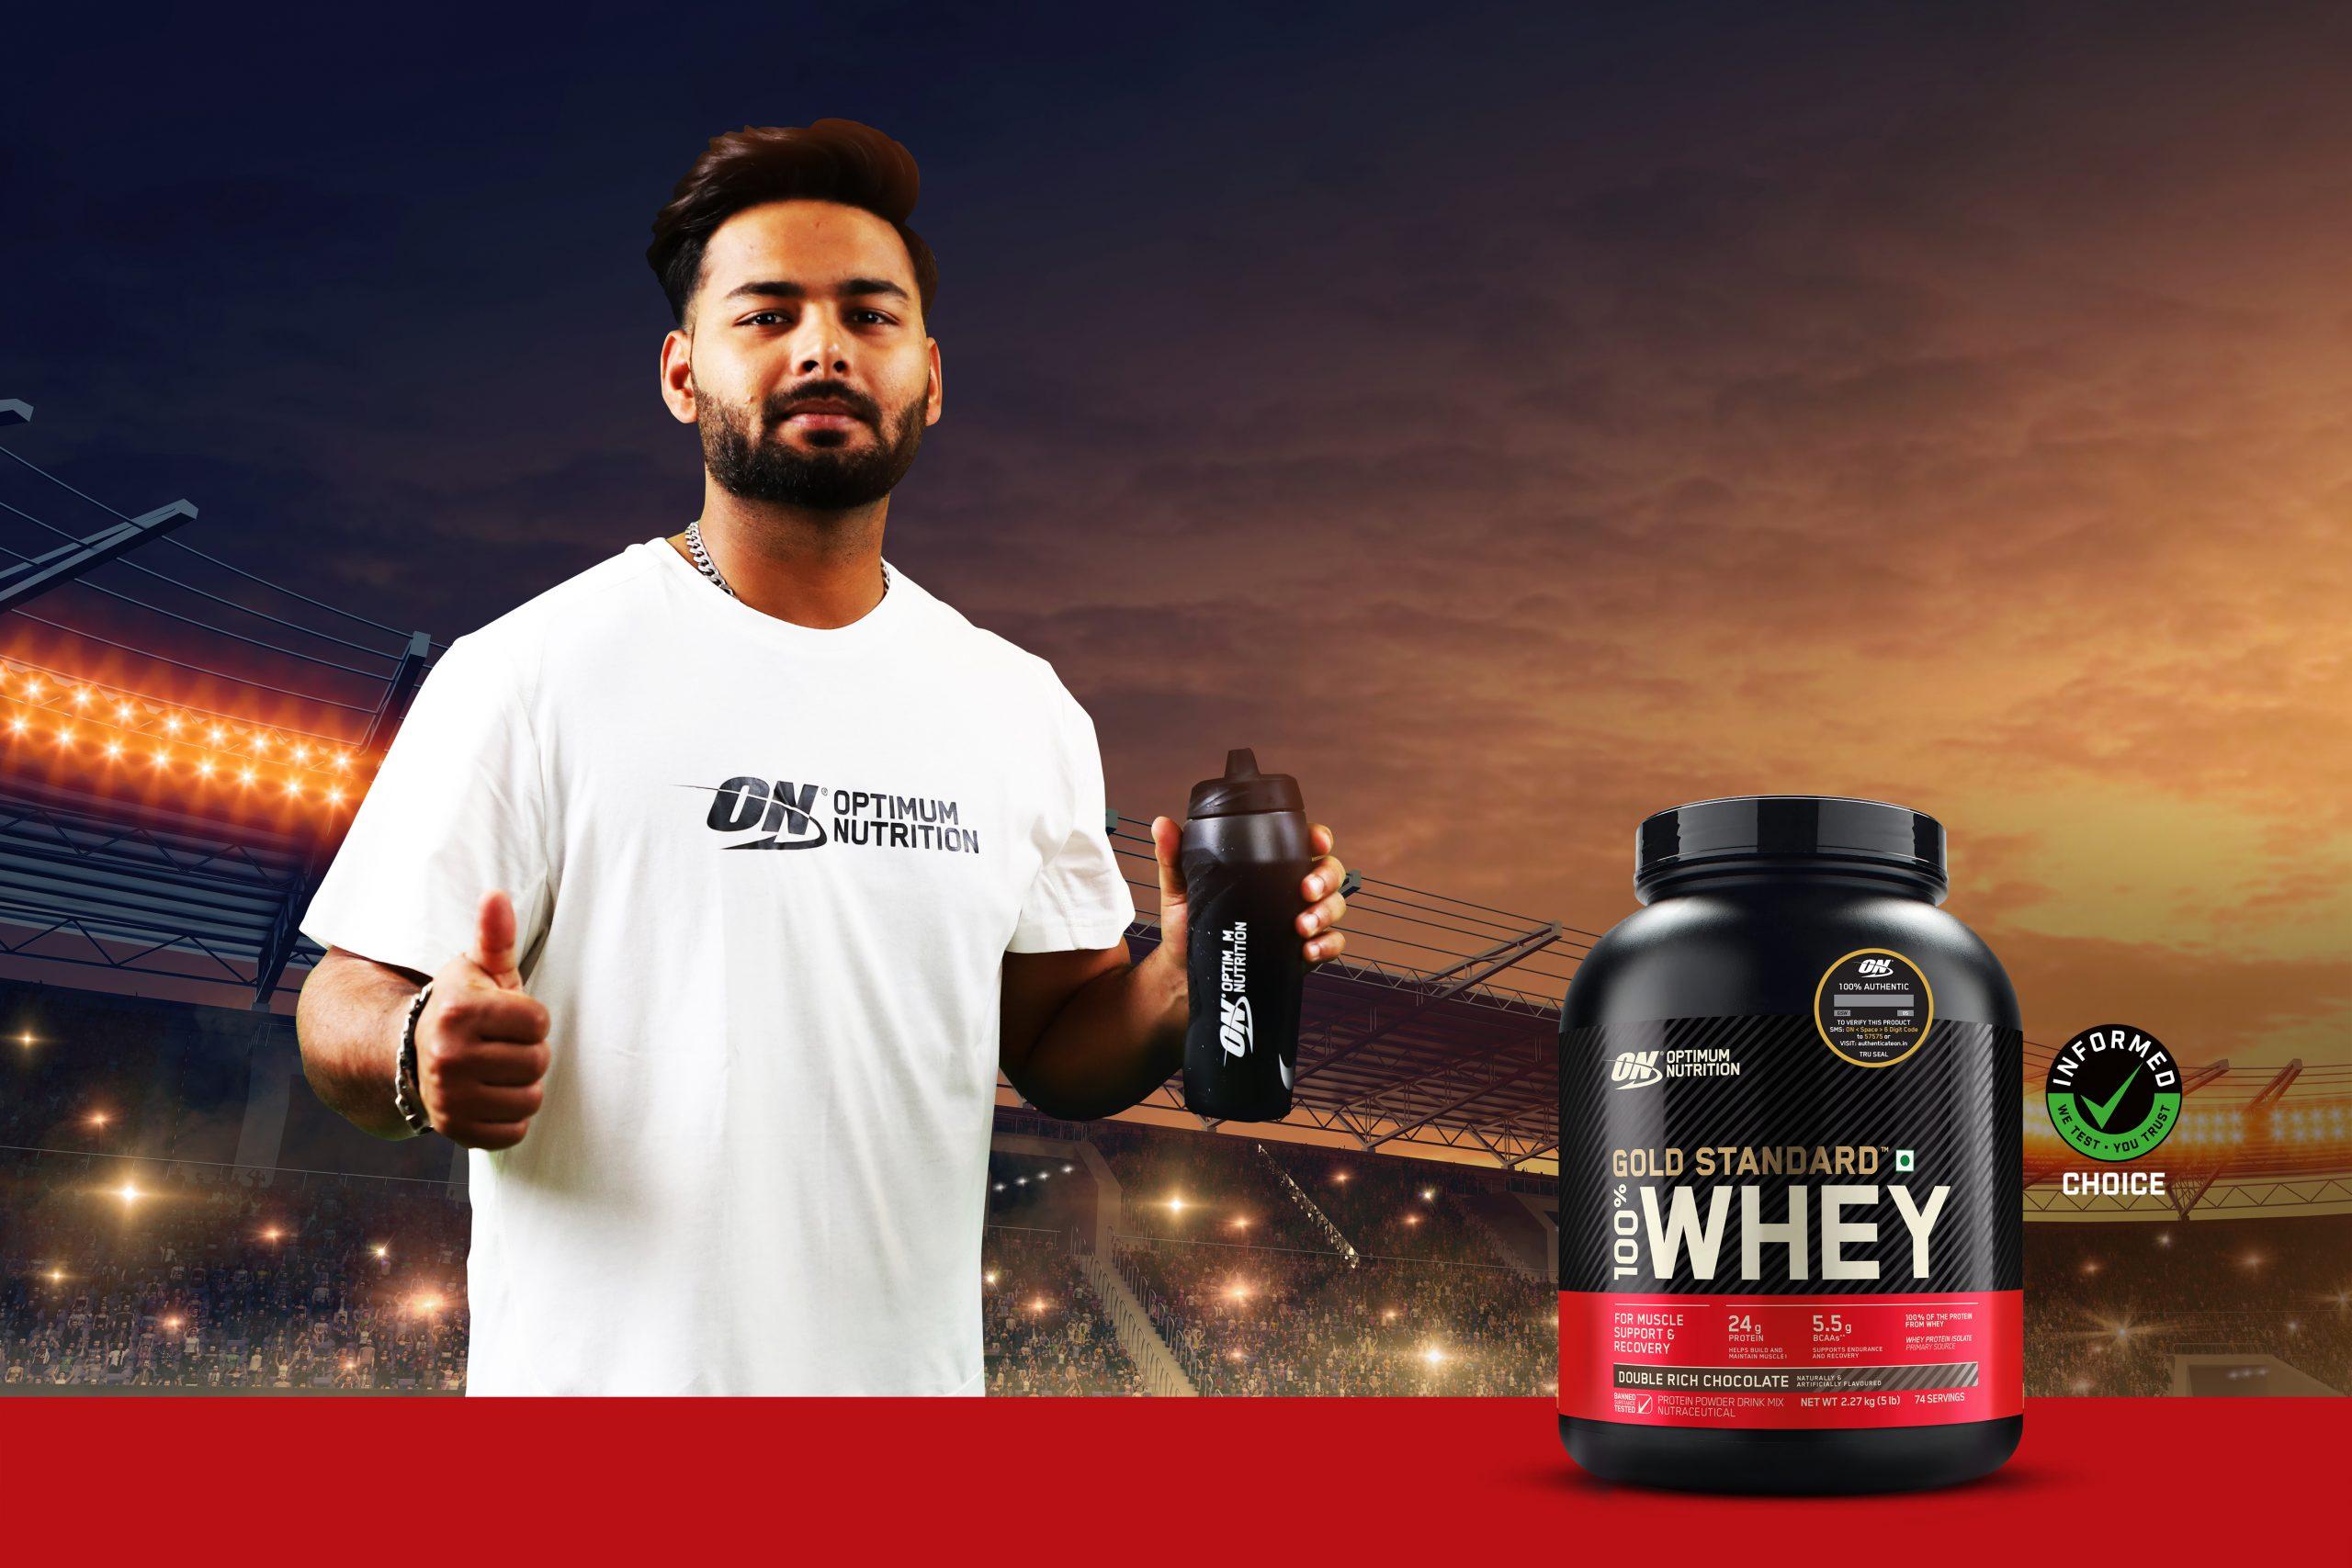 Optimum Nutrition names Rishabh Pant as their brand athlete